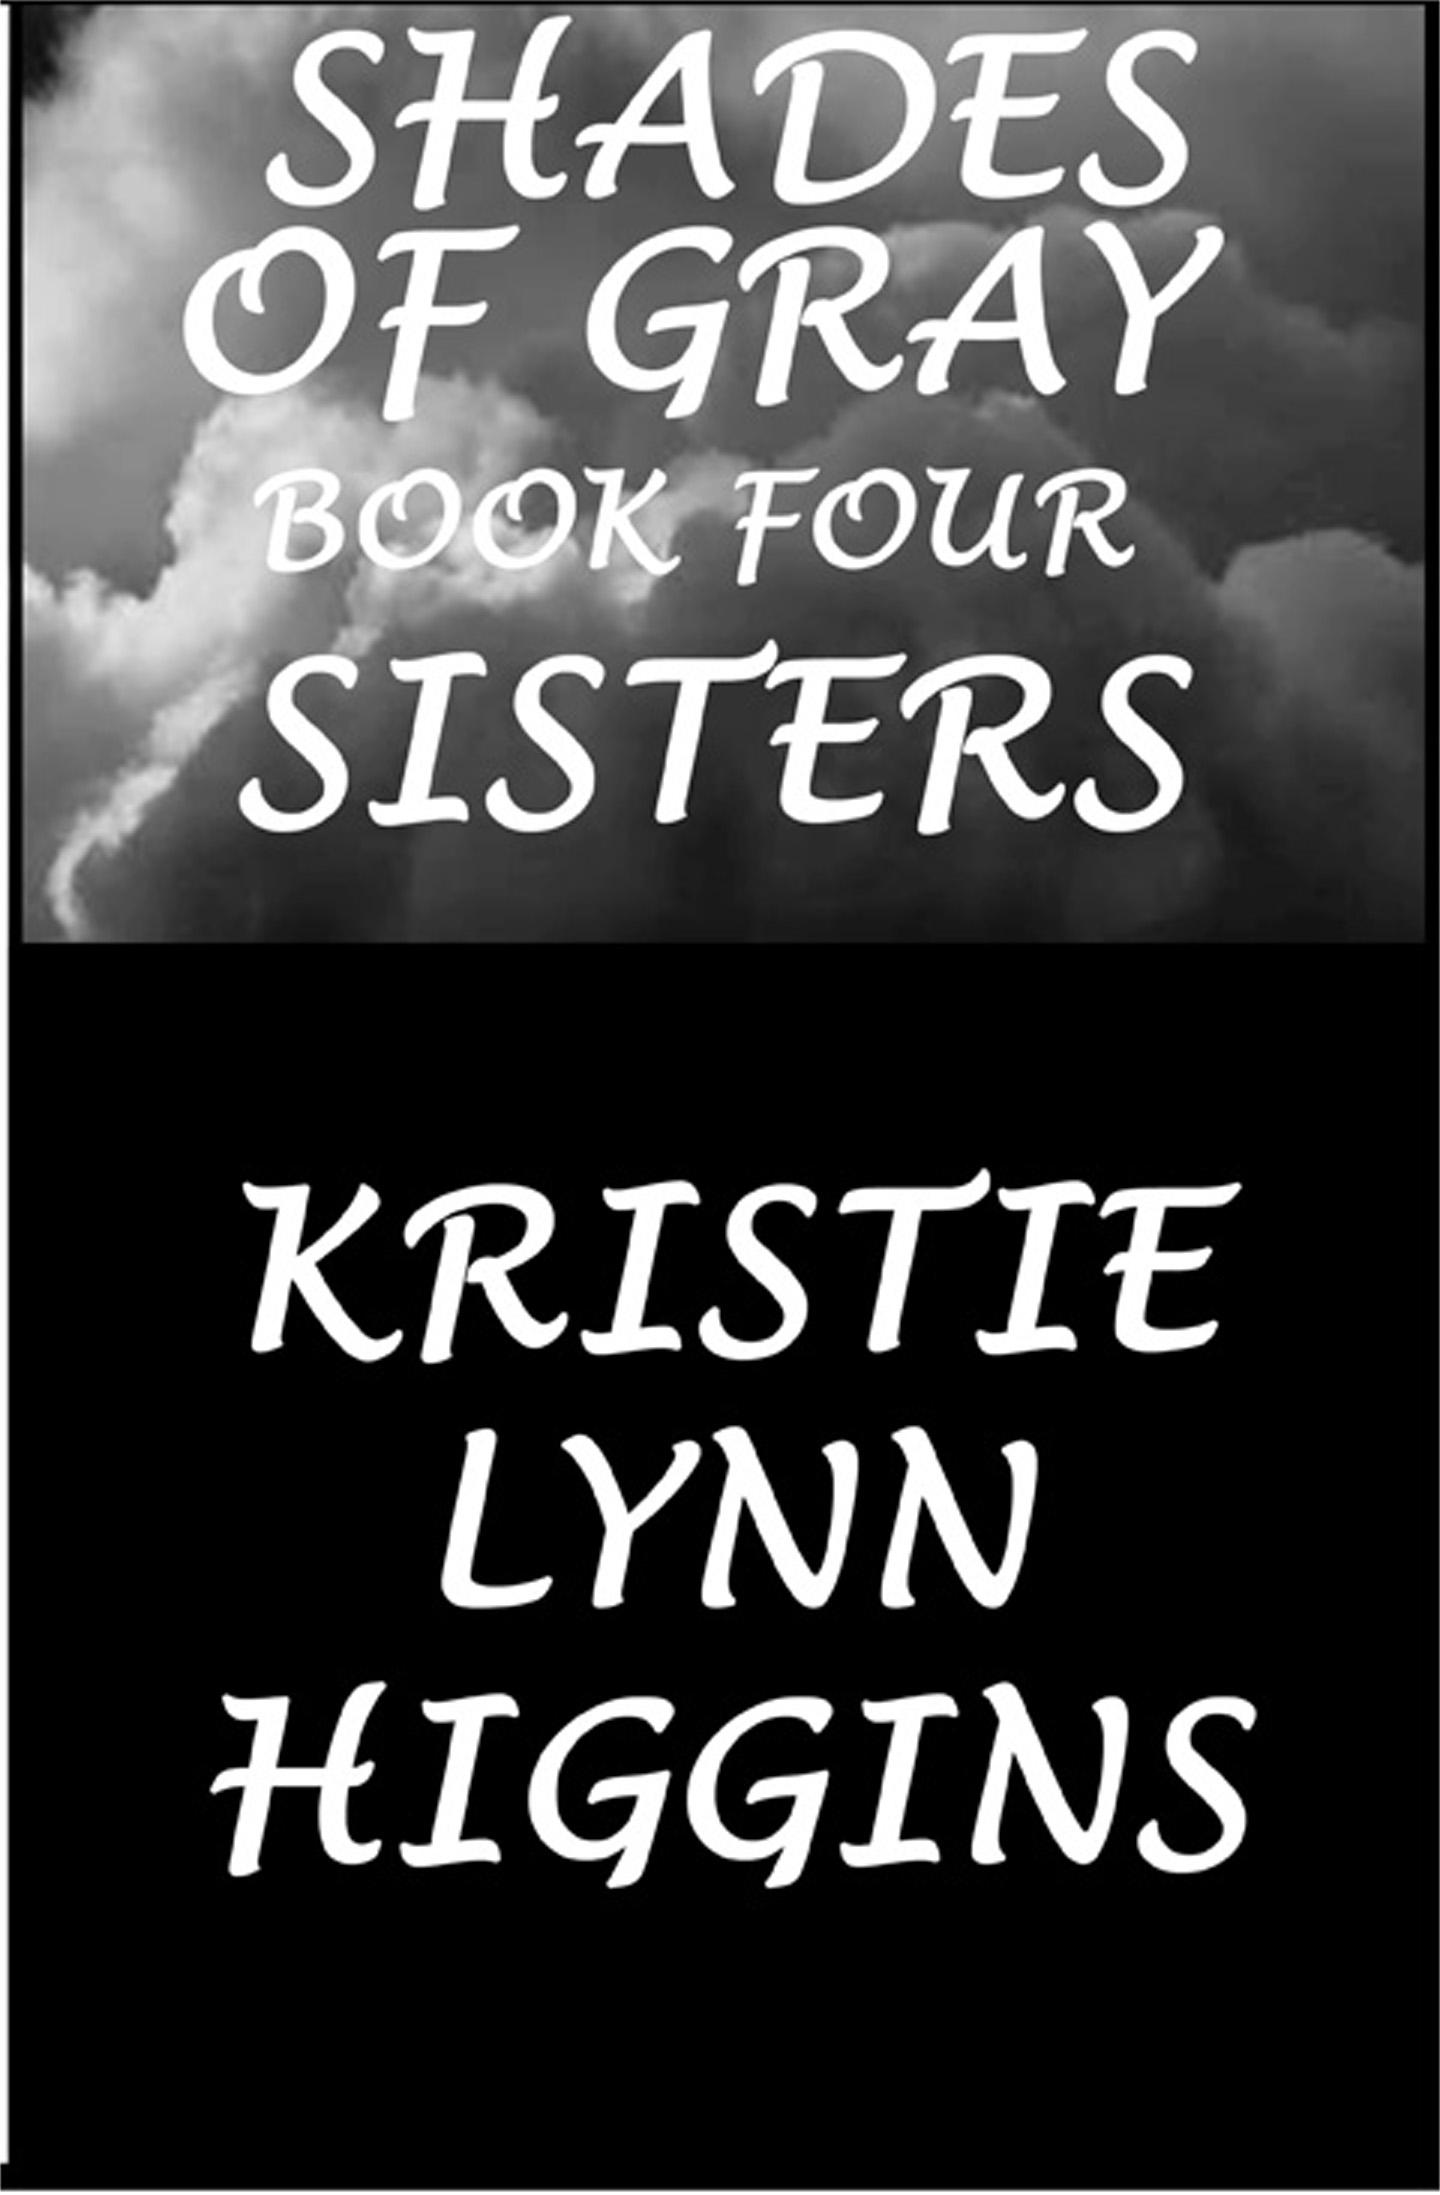 Kristie Lynn Higgins - #4 Shades of Gray- Sisters